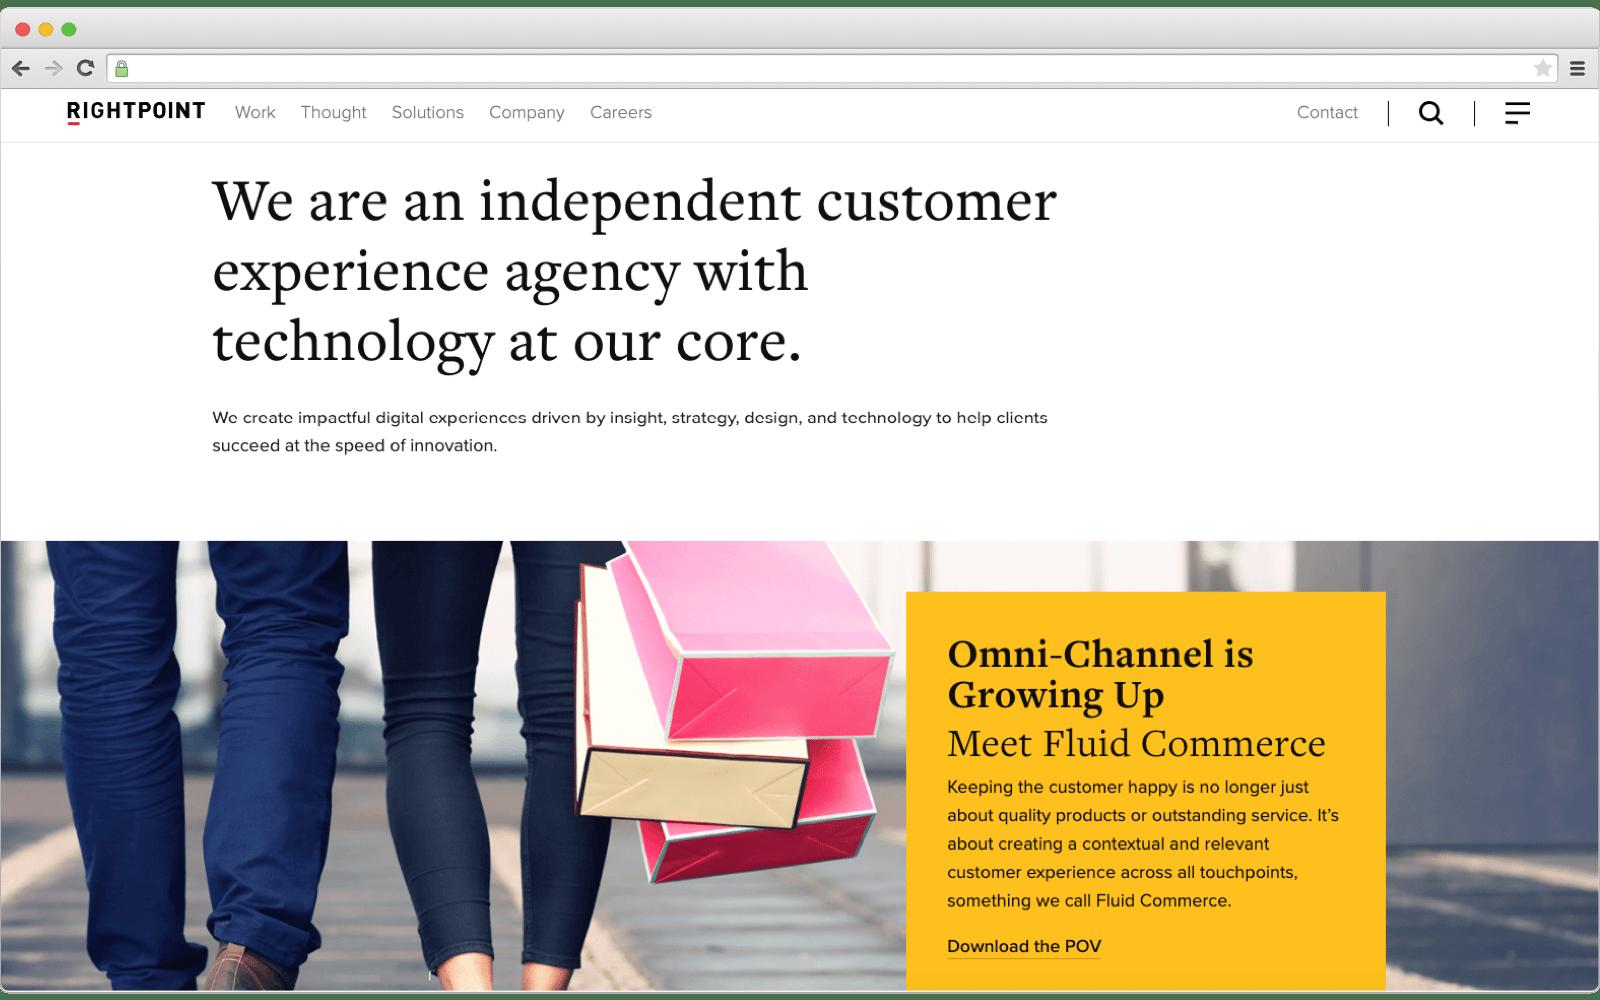 Ecommerce development company: Rightpoint